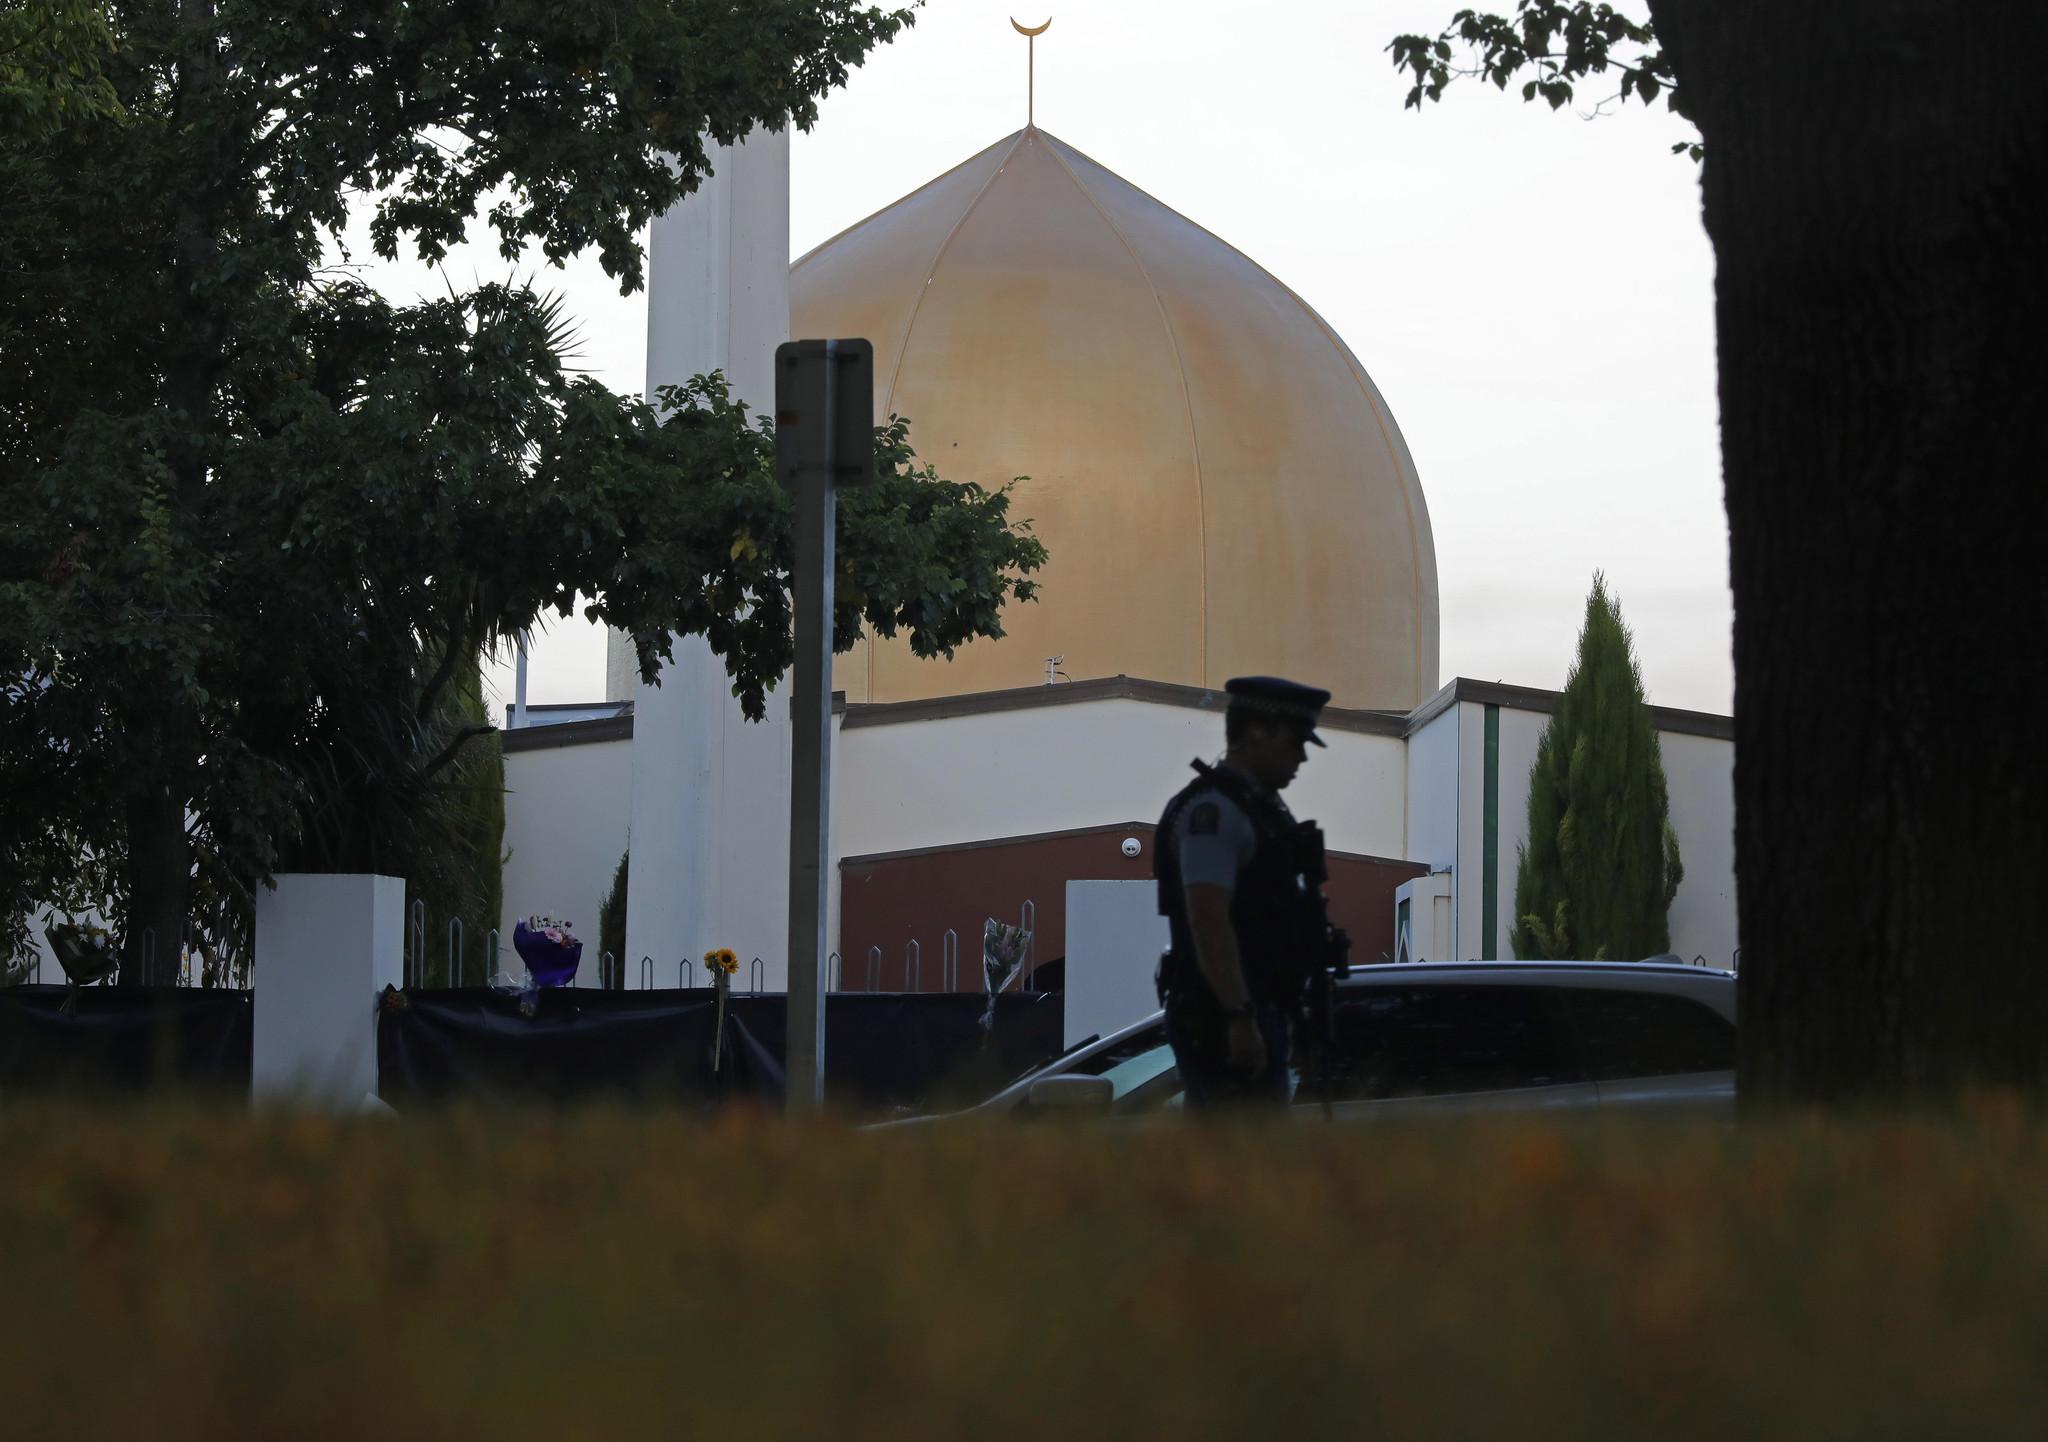 Masjid Christchurch Image: Flipboard: New Zealand Mosque Attack Suspect Brenton